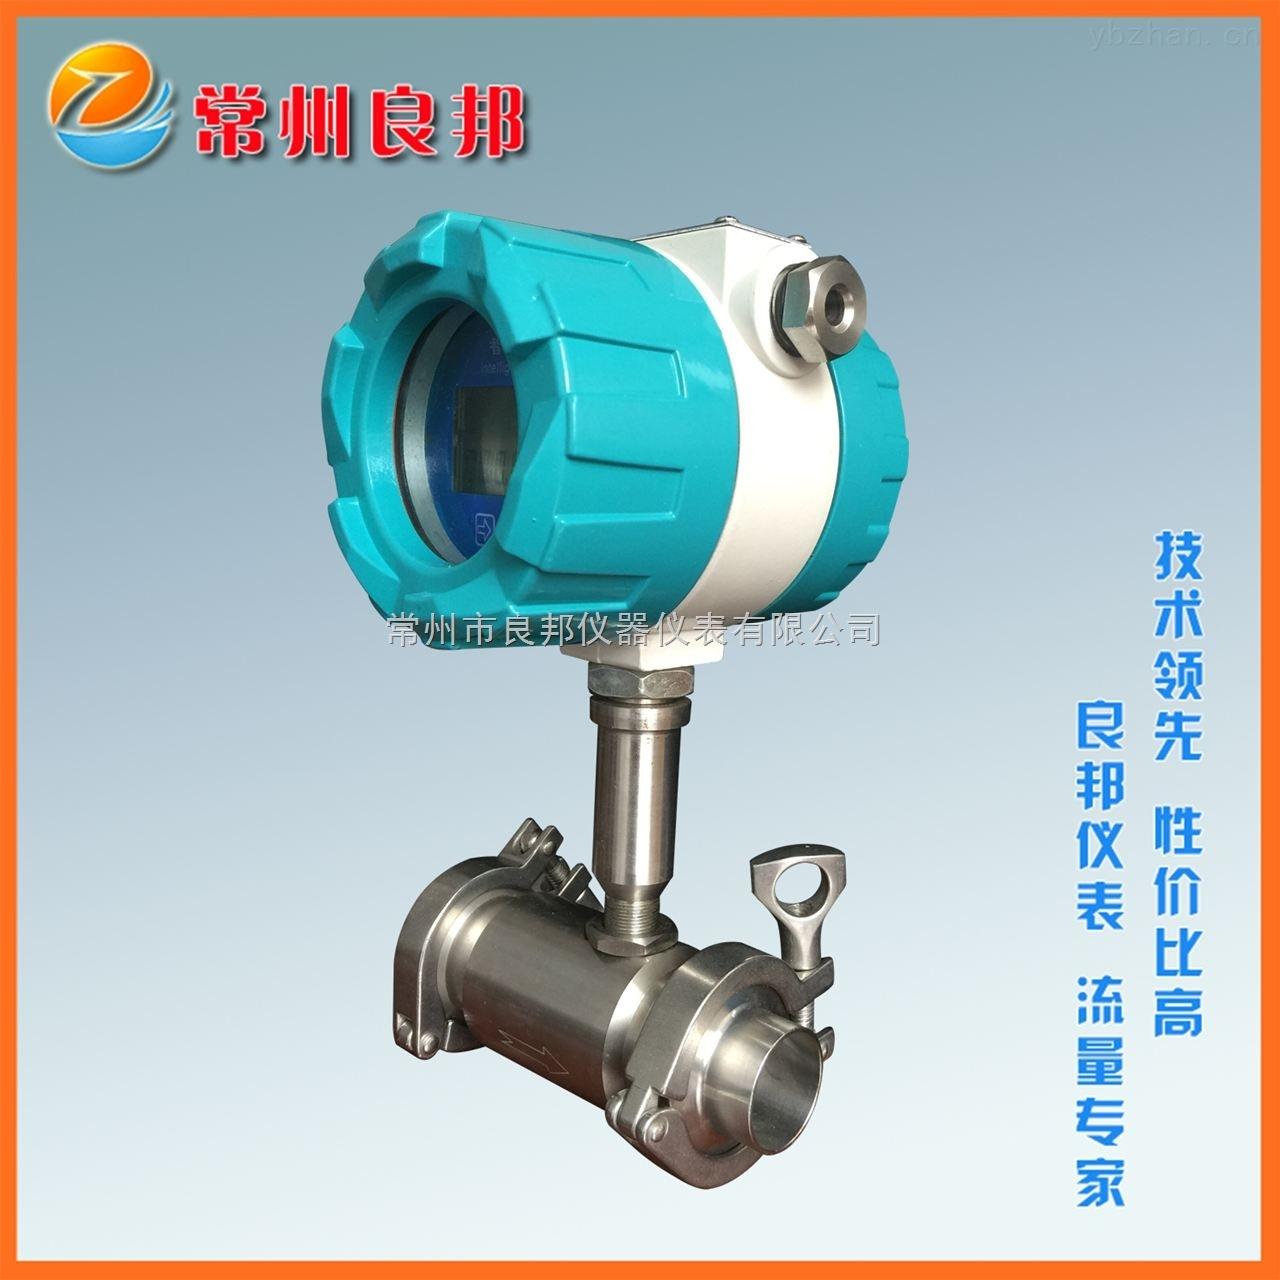 LWGY-50-液体涡轮流量计 24V供电电信号输出 叶轮经久耐用 测量精度高数字显示